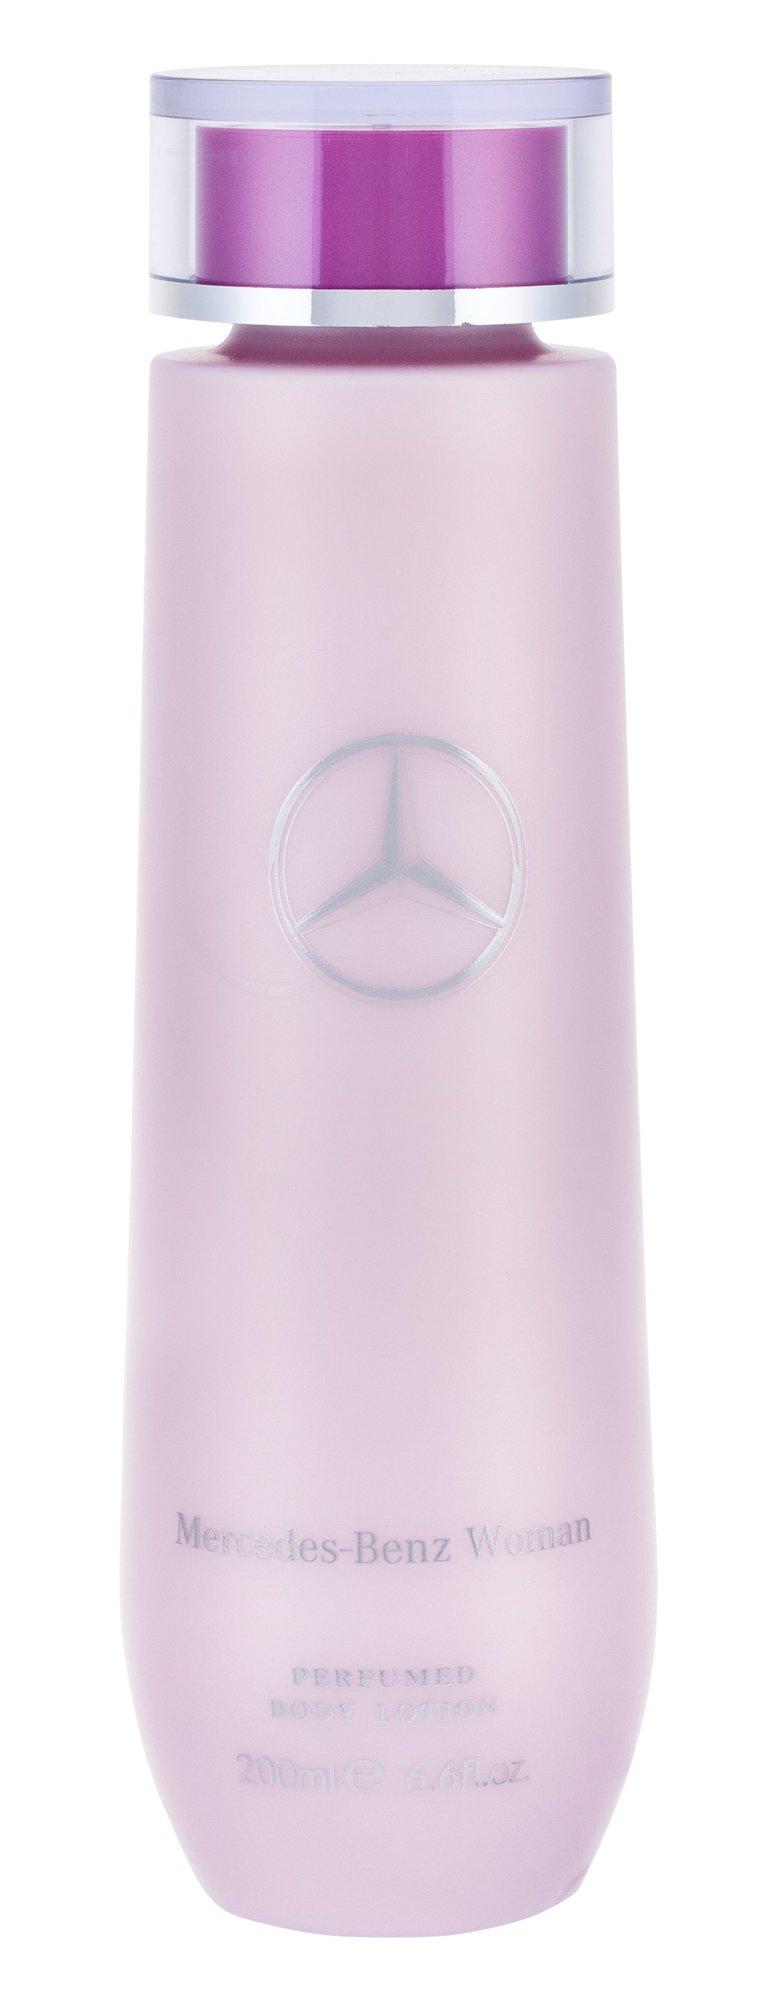 Kūno losjonas Mercedes-Benz Mercedes-Benz Woman